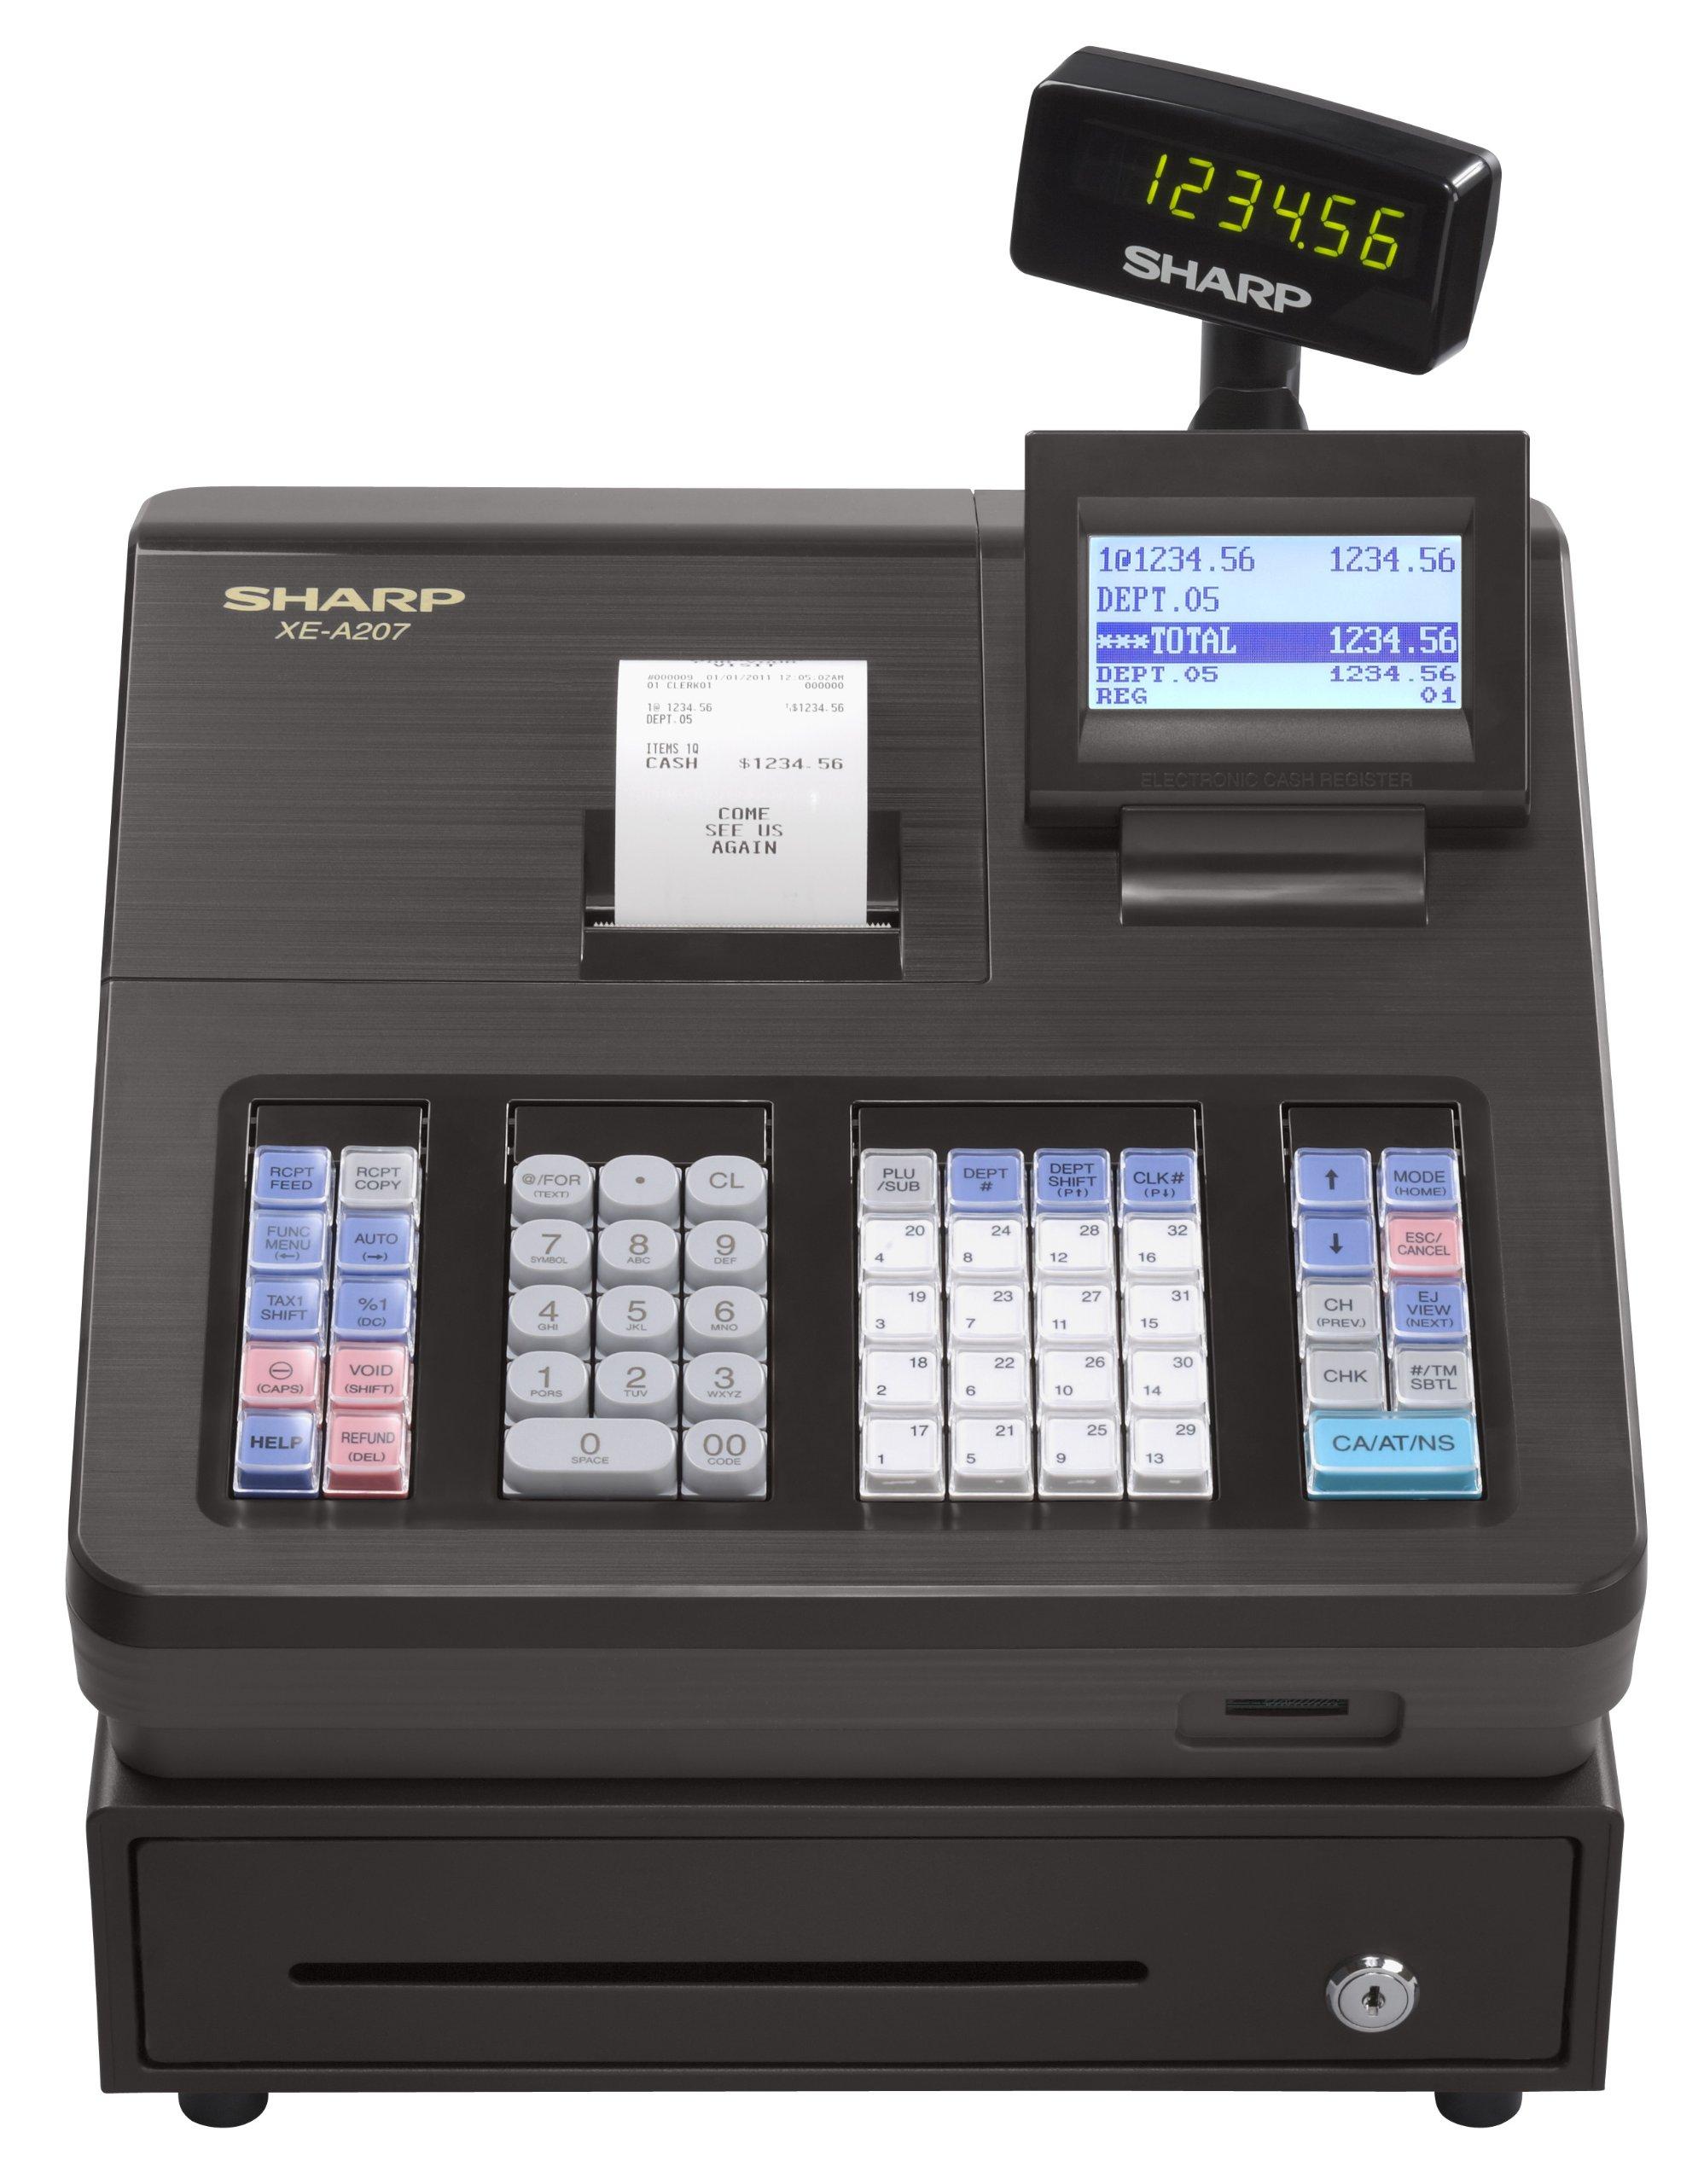 Sharp XEA207 Menu Based Control System Cash Register by Sharp